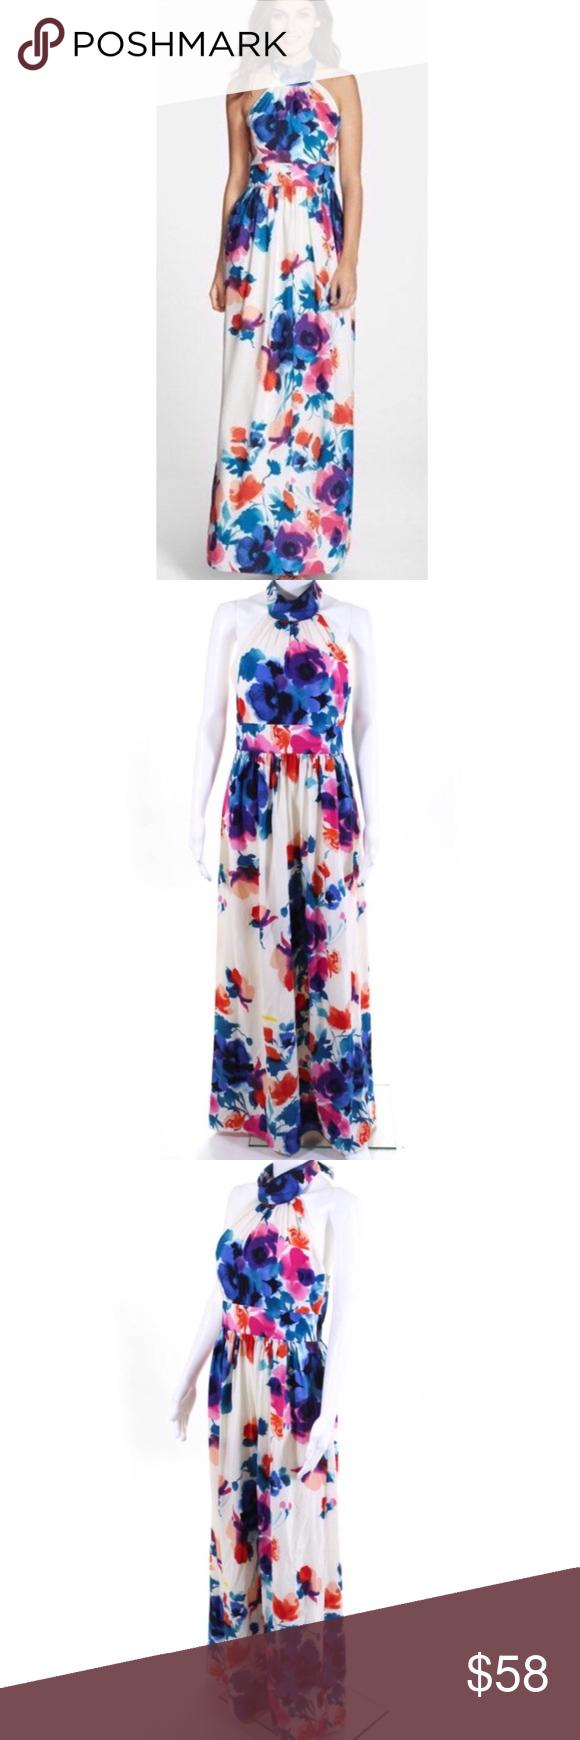 Eliza J Watercolor Floral Tie Neck Maxi Dress 6 Eliza J Dresses Maxi Watercolor Floral Dress Clothes Design [ 1740 x 580 Pixel ]